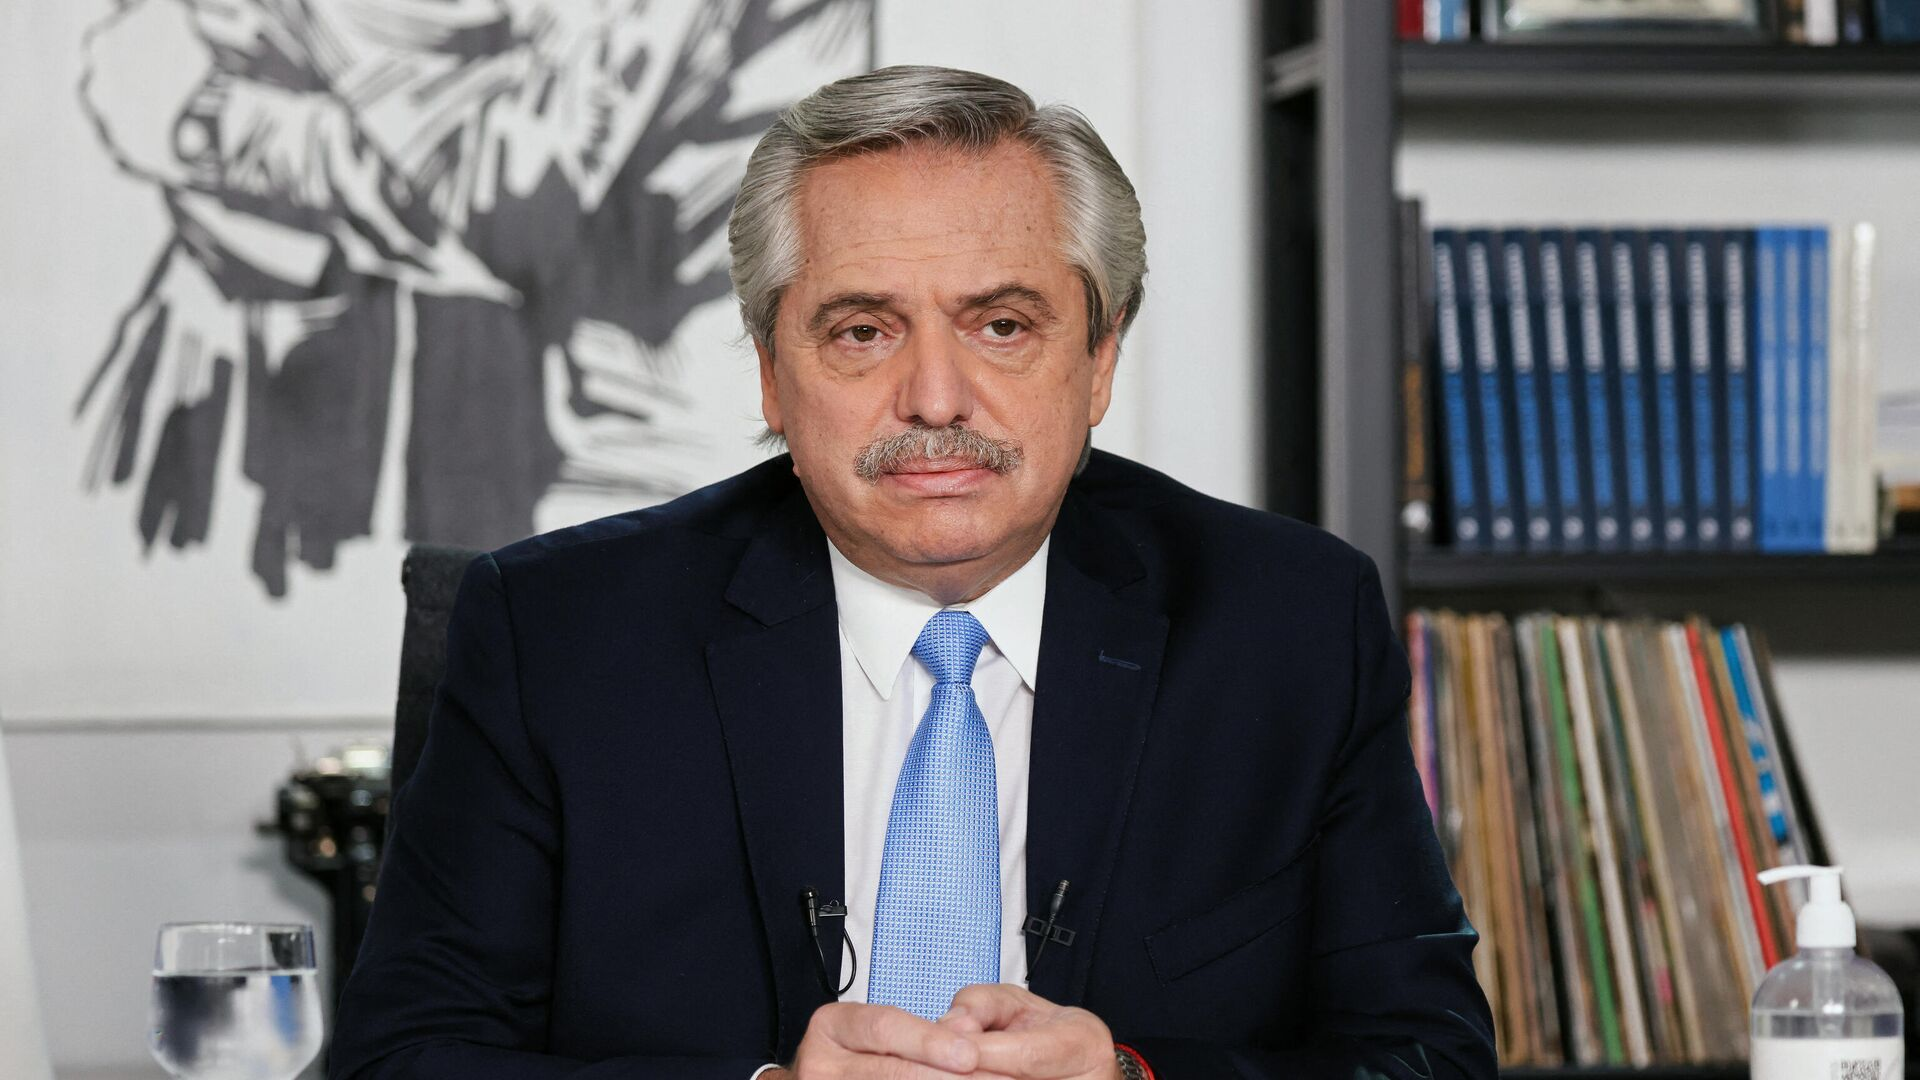 Alberto Fernández, presidente de Argentina - Sputnik Mundo, 1920, 16.04.2021